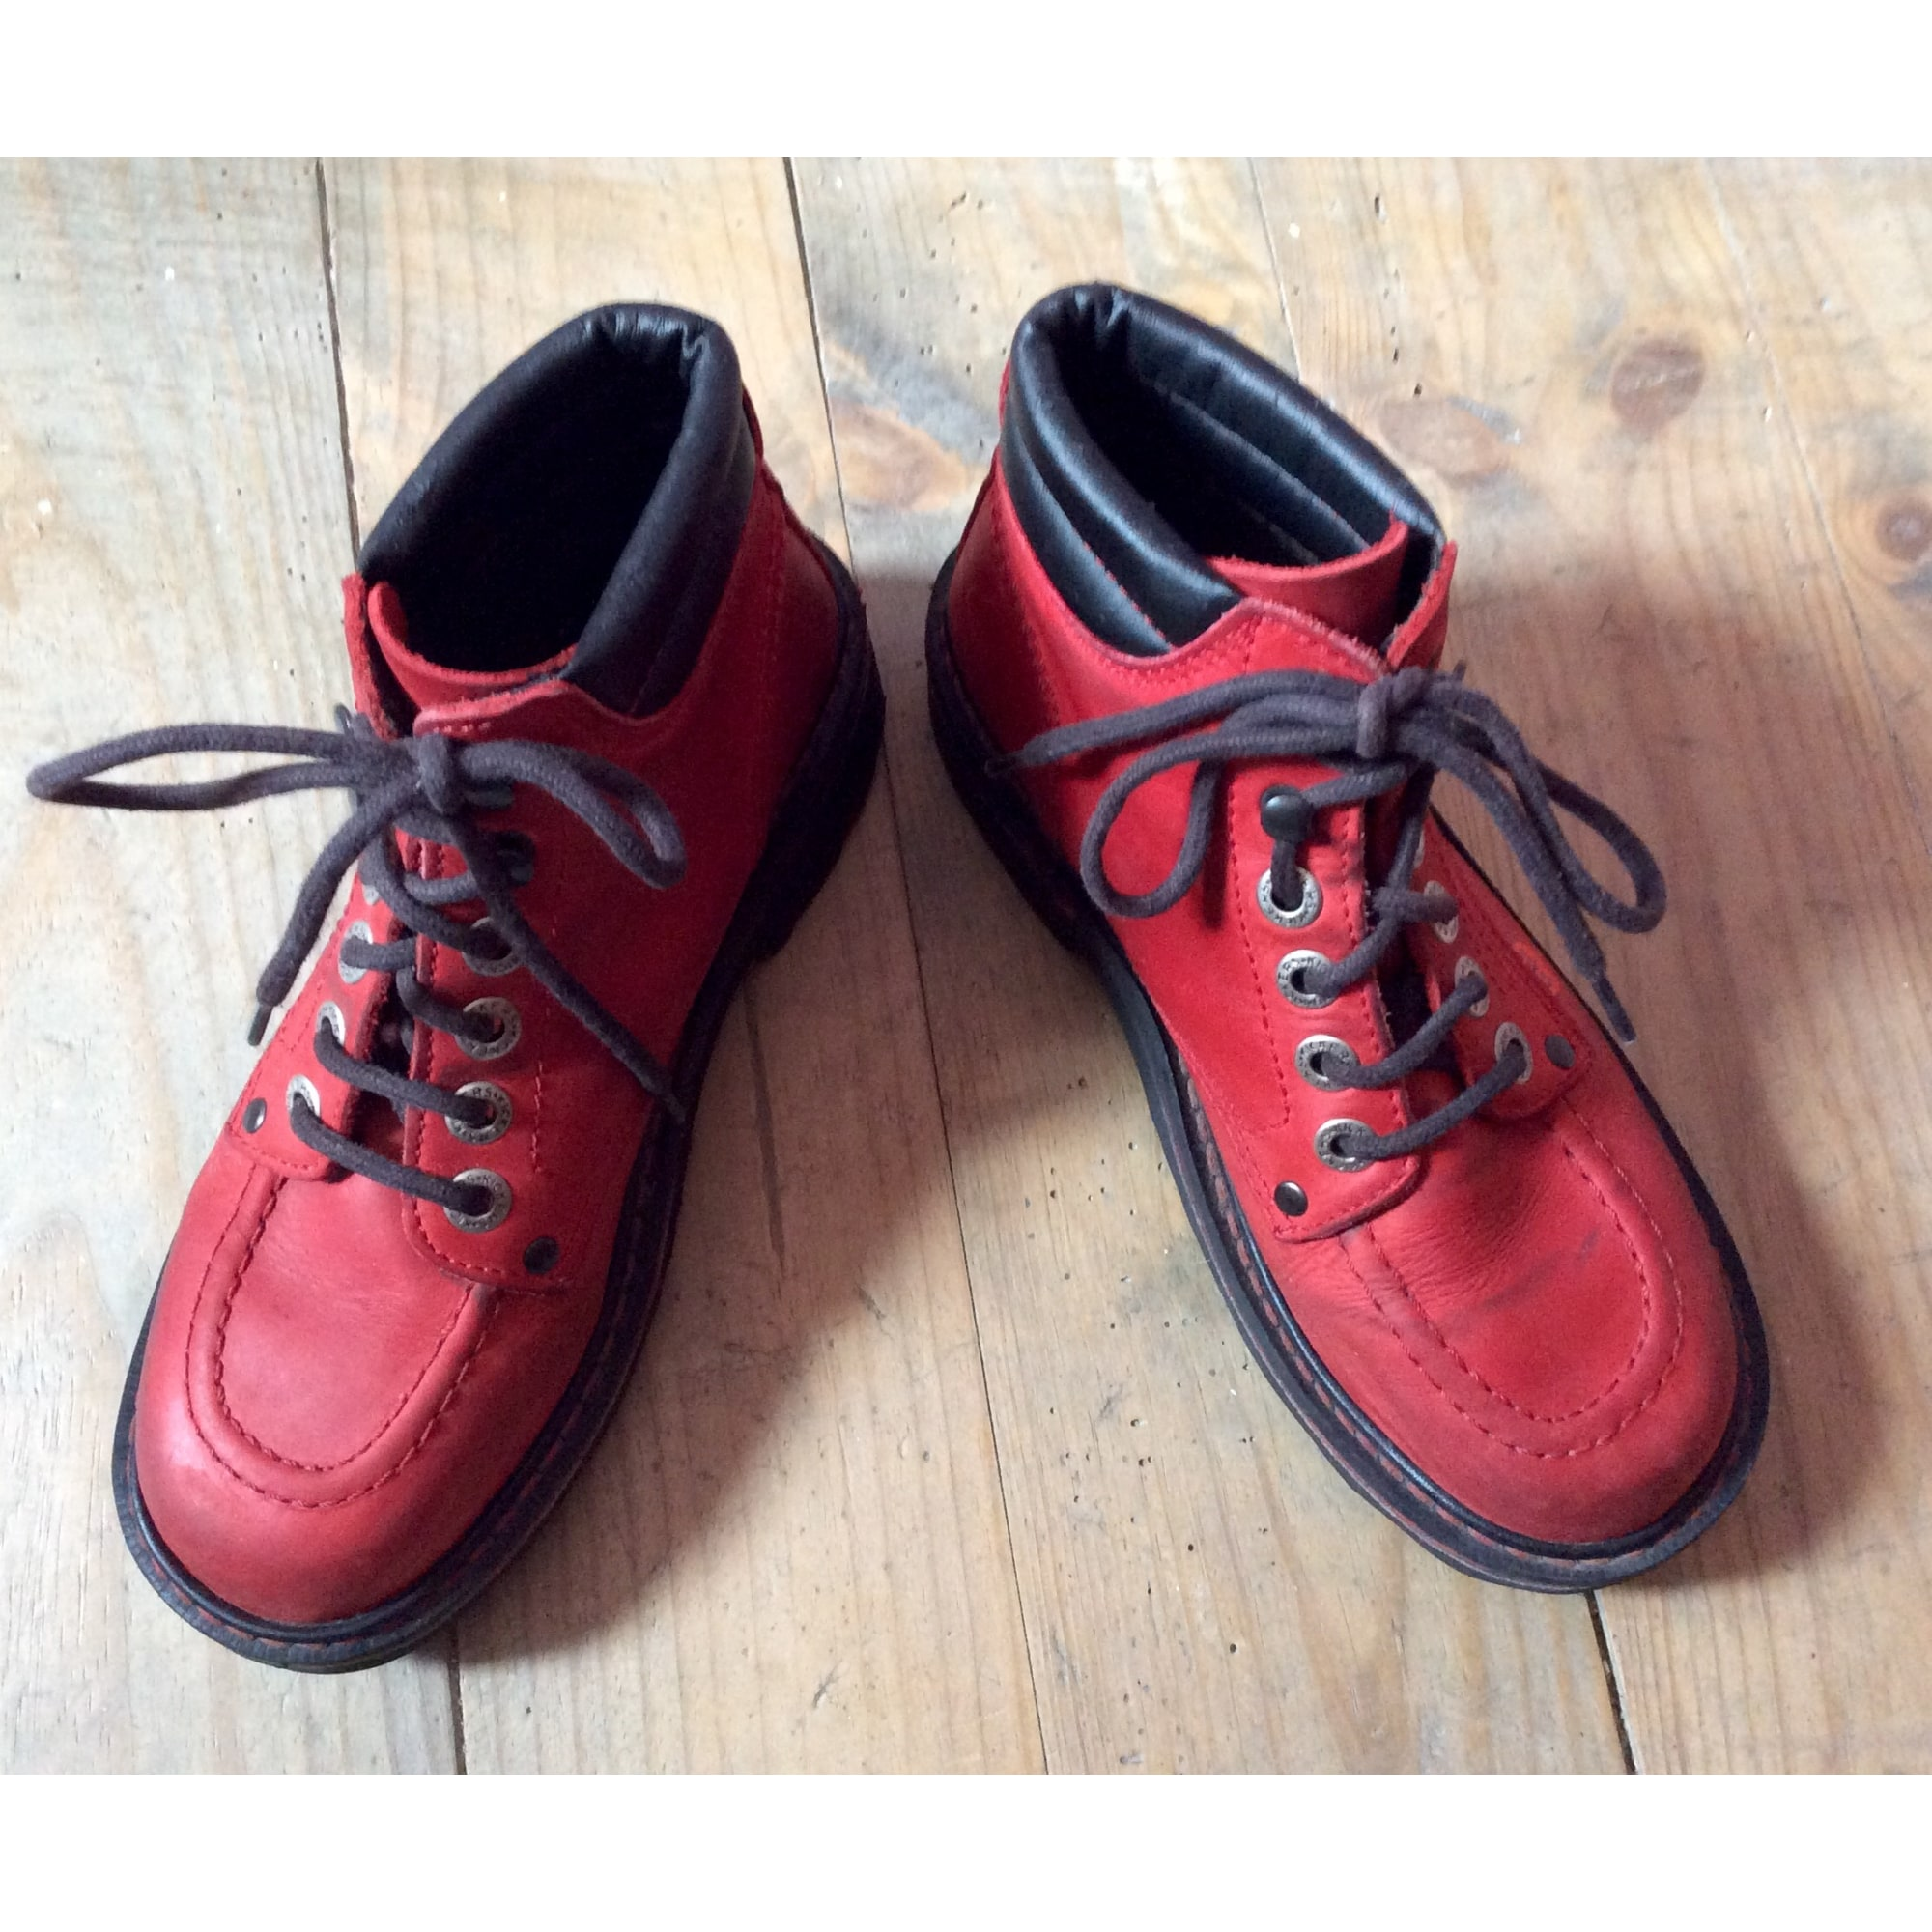 Kickers Dressing 38 Vide En Chaussures lKF1cJ